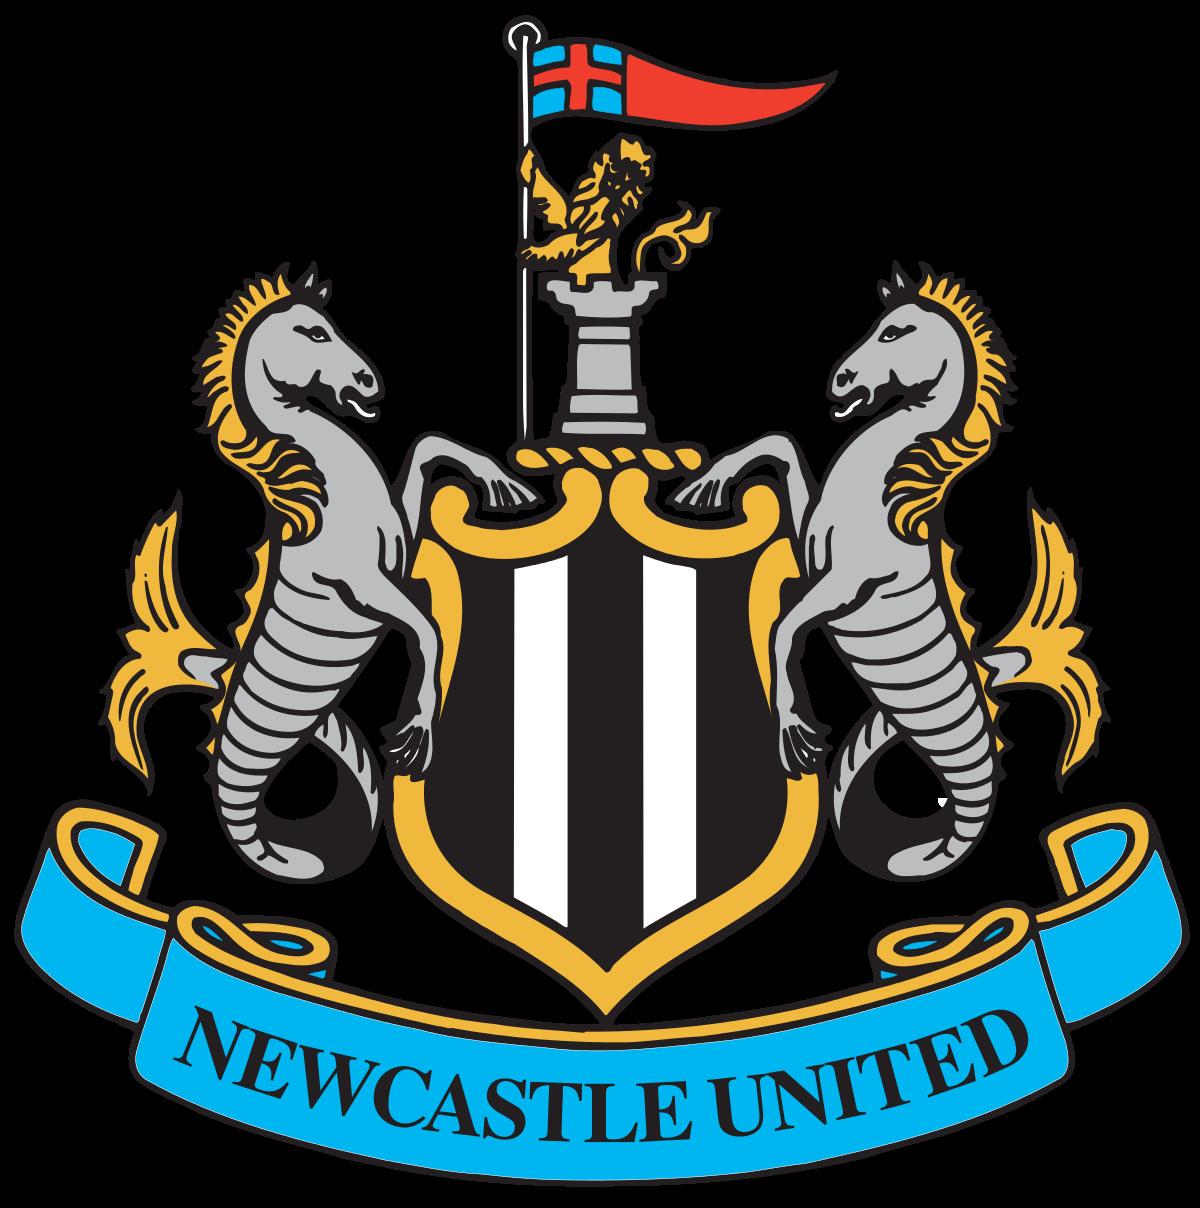 Newcastle united f c. Goals clipart road ahead